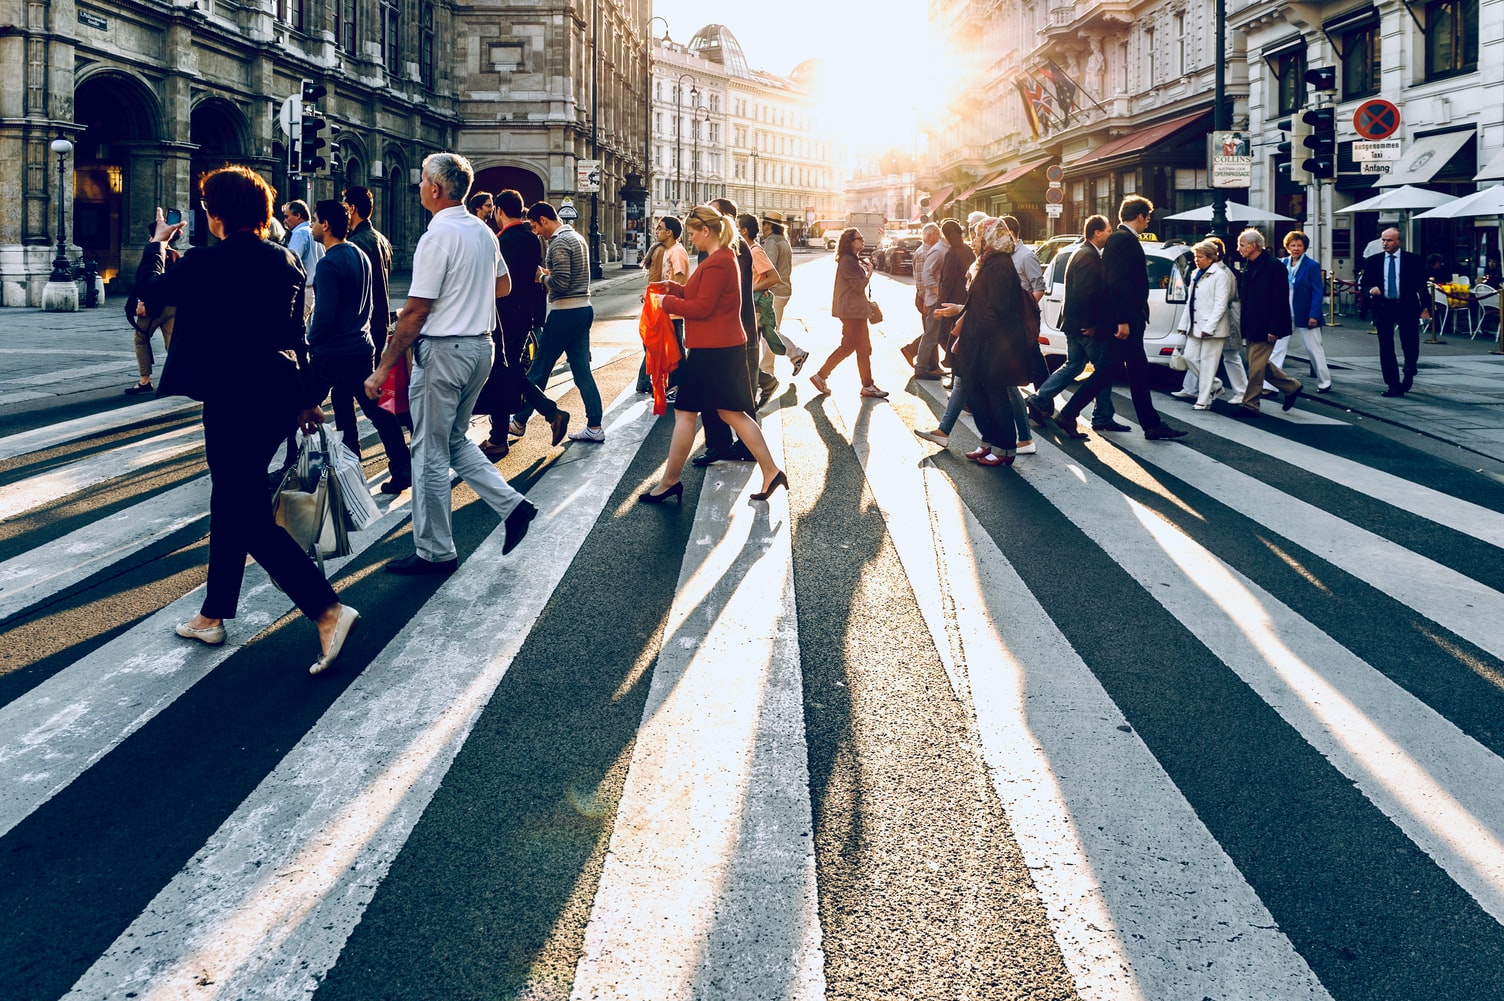 7 Experts Discuss How Long-Term Marketing Benefits Brands